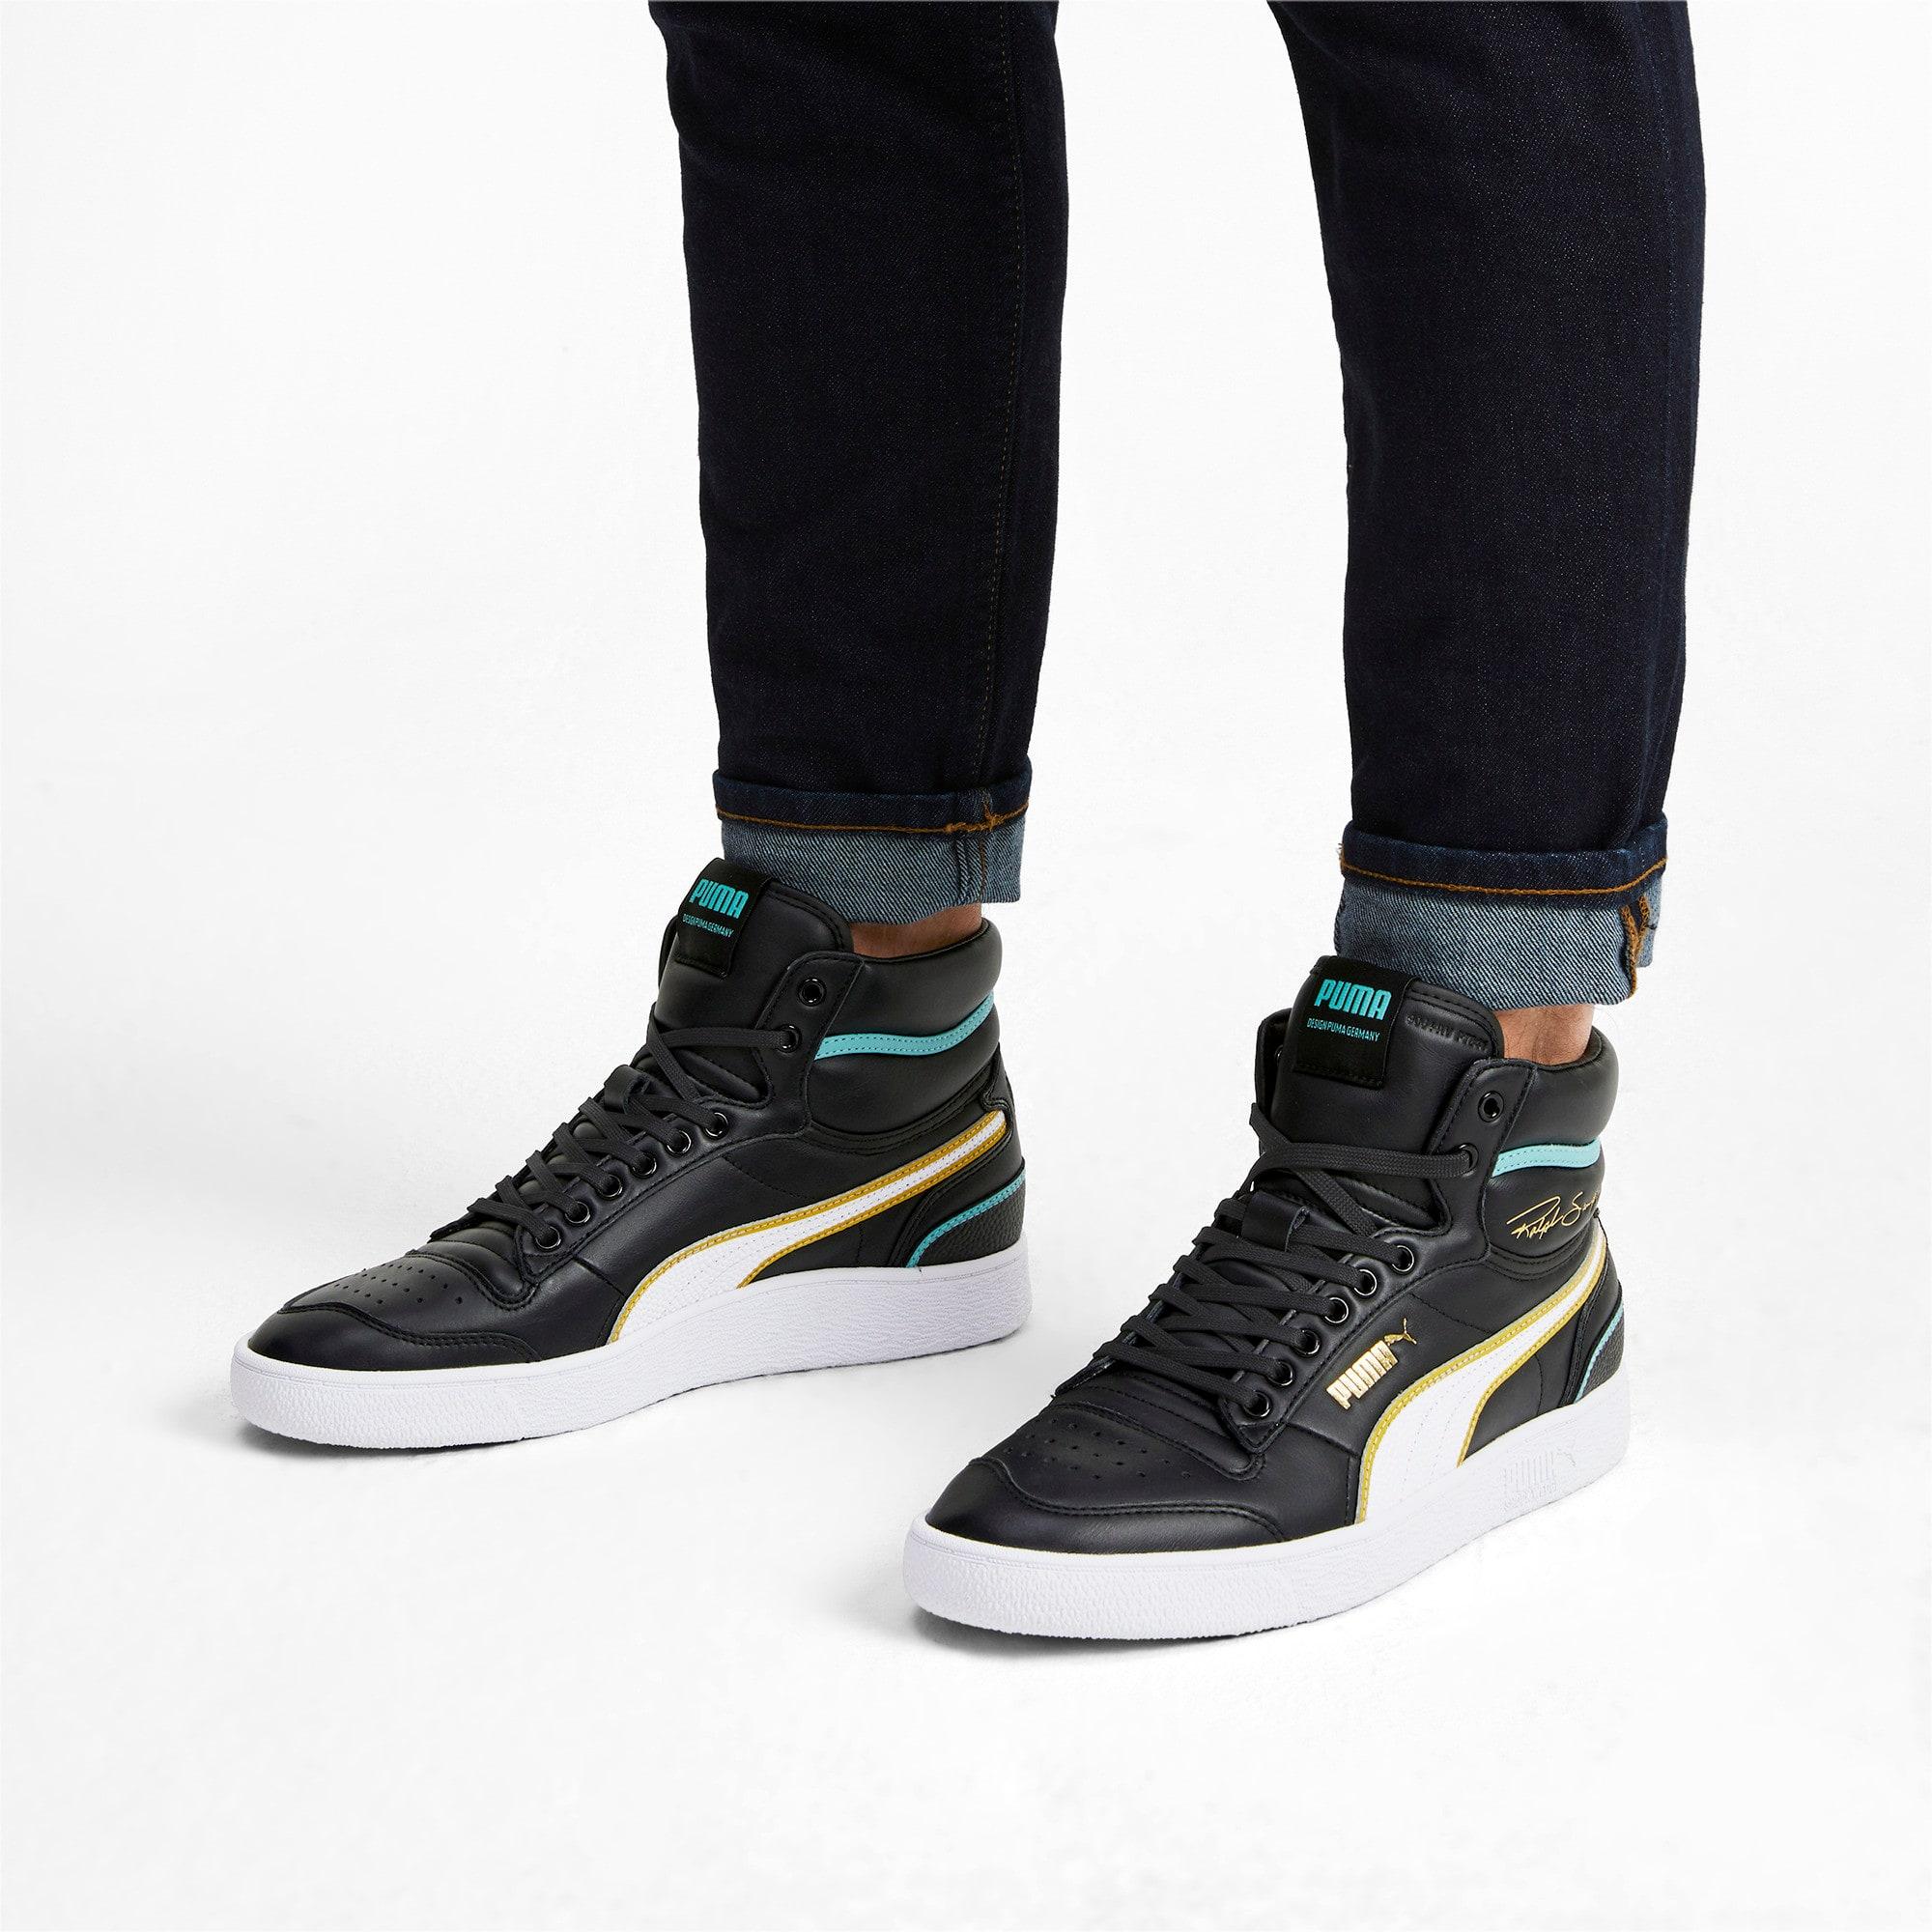 Thumbnail 2 of Ralph Sampson Mid Hoops Sneakers, Puma Blk-Puma Wht-Puma Wht, medium